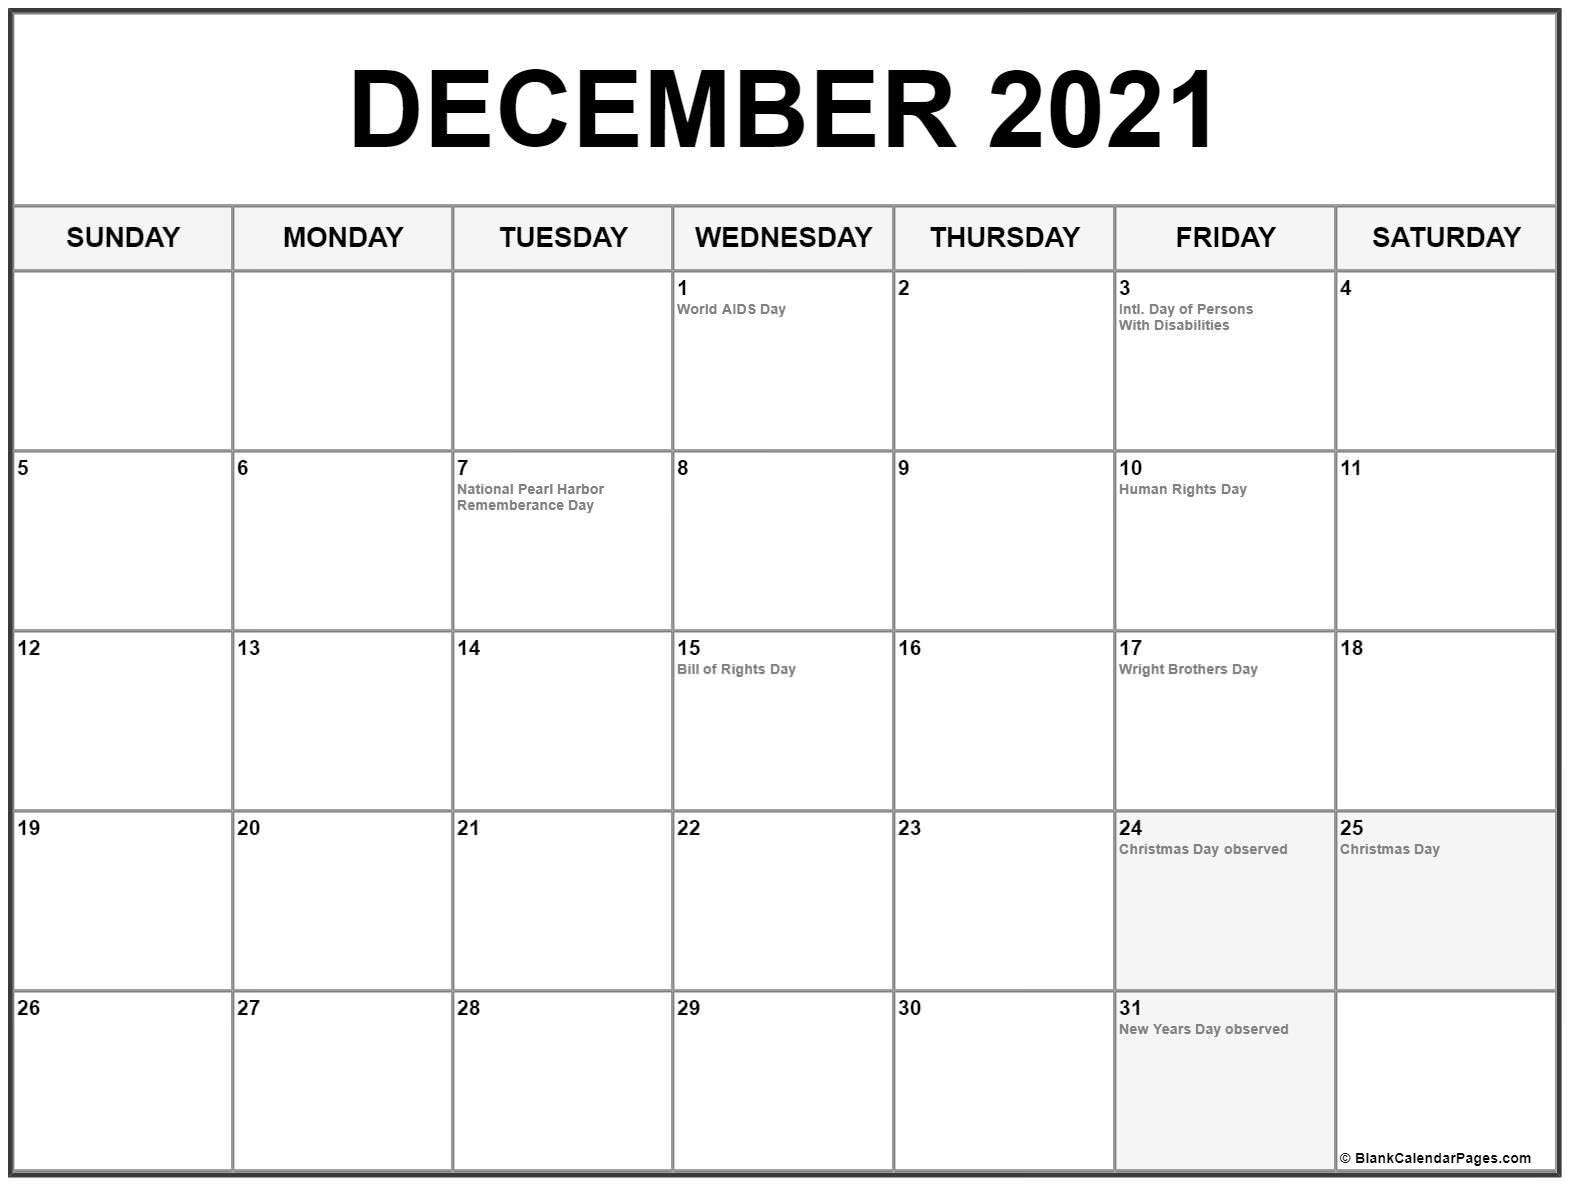 Get 2021 Calendar Printable December Christmas